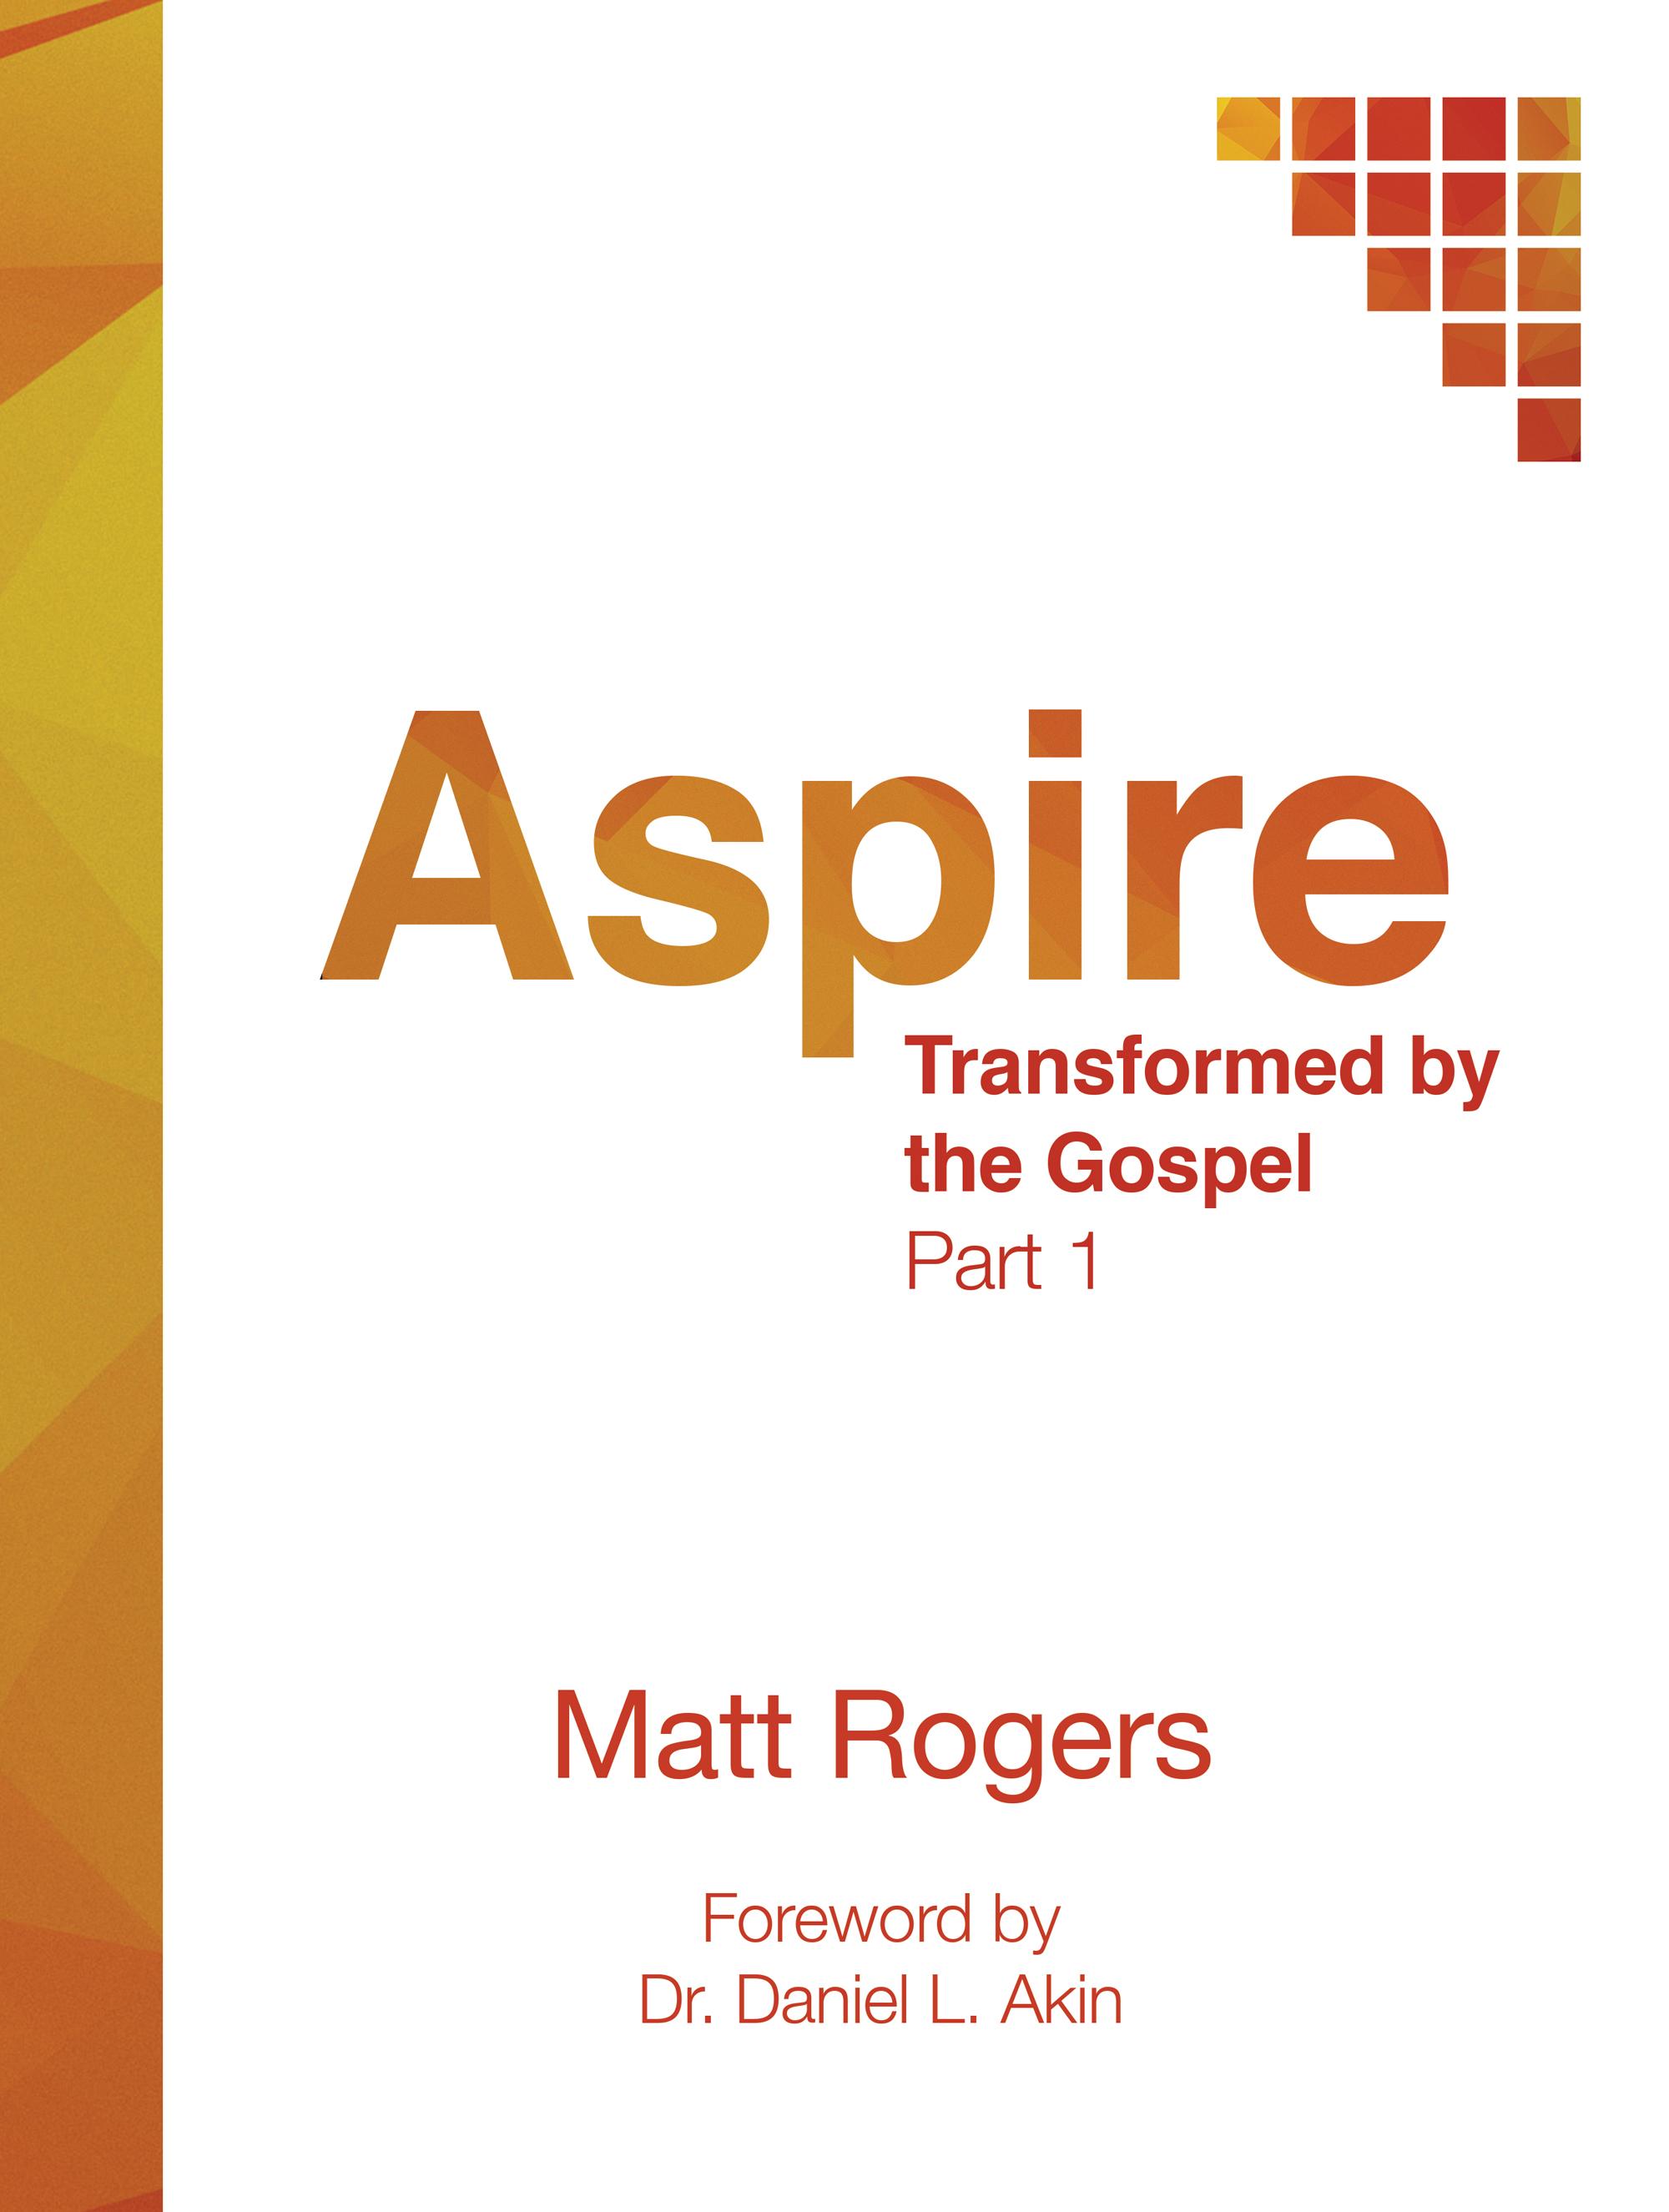 Aspire-Part1-Cover